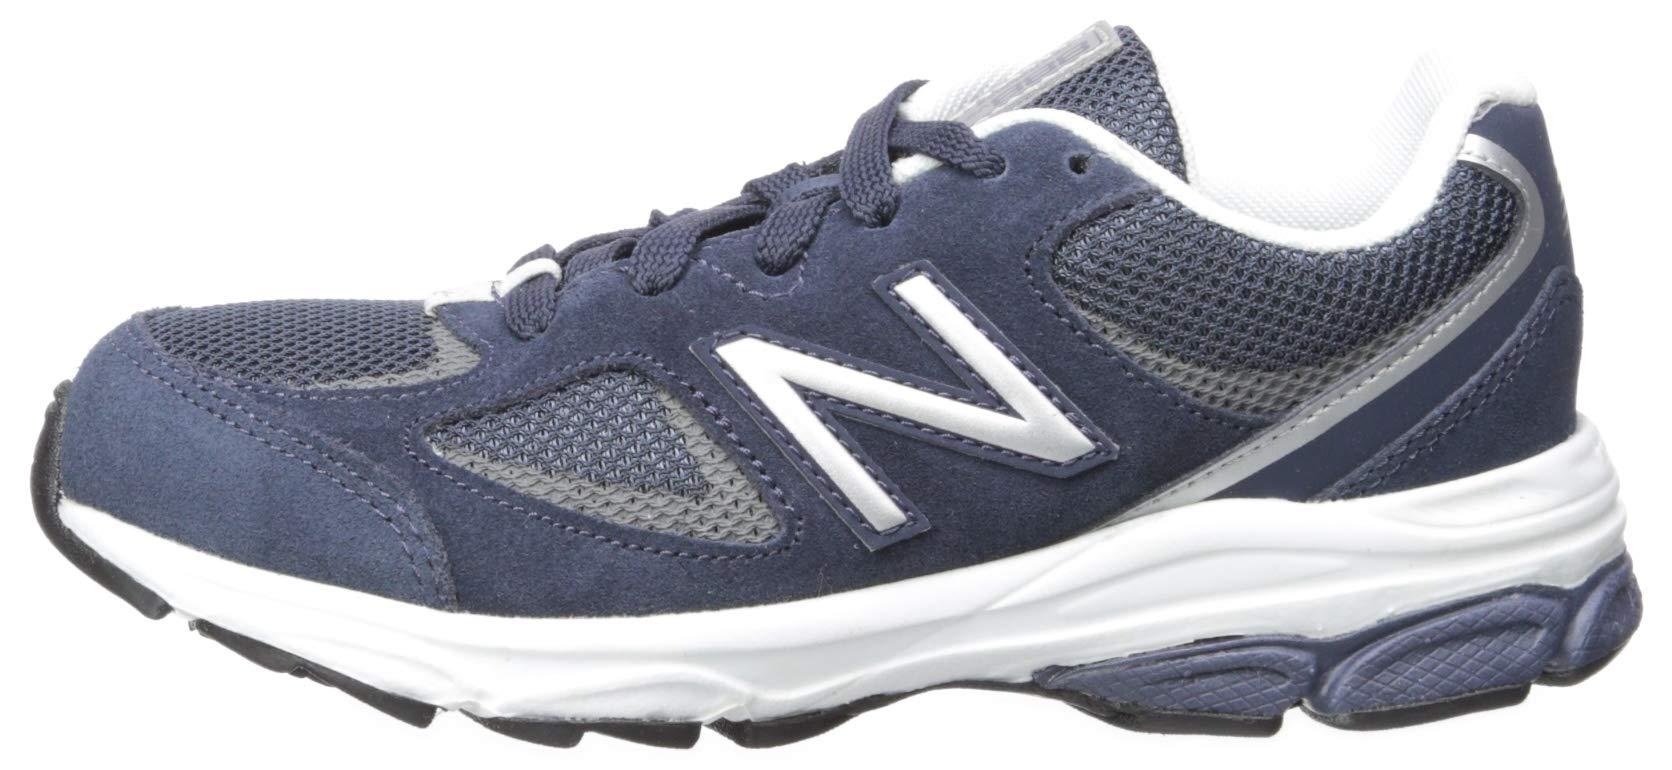 New Balance Boys' 888v2 Running Shoe, Navy/Grey, 2.5 M US Little Kid by New Balance (Image #5)